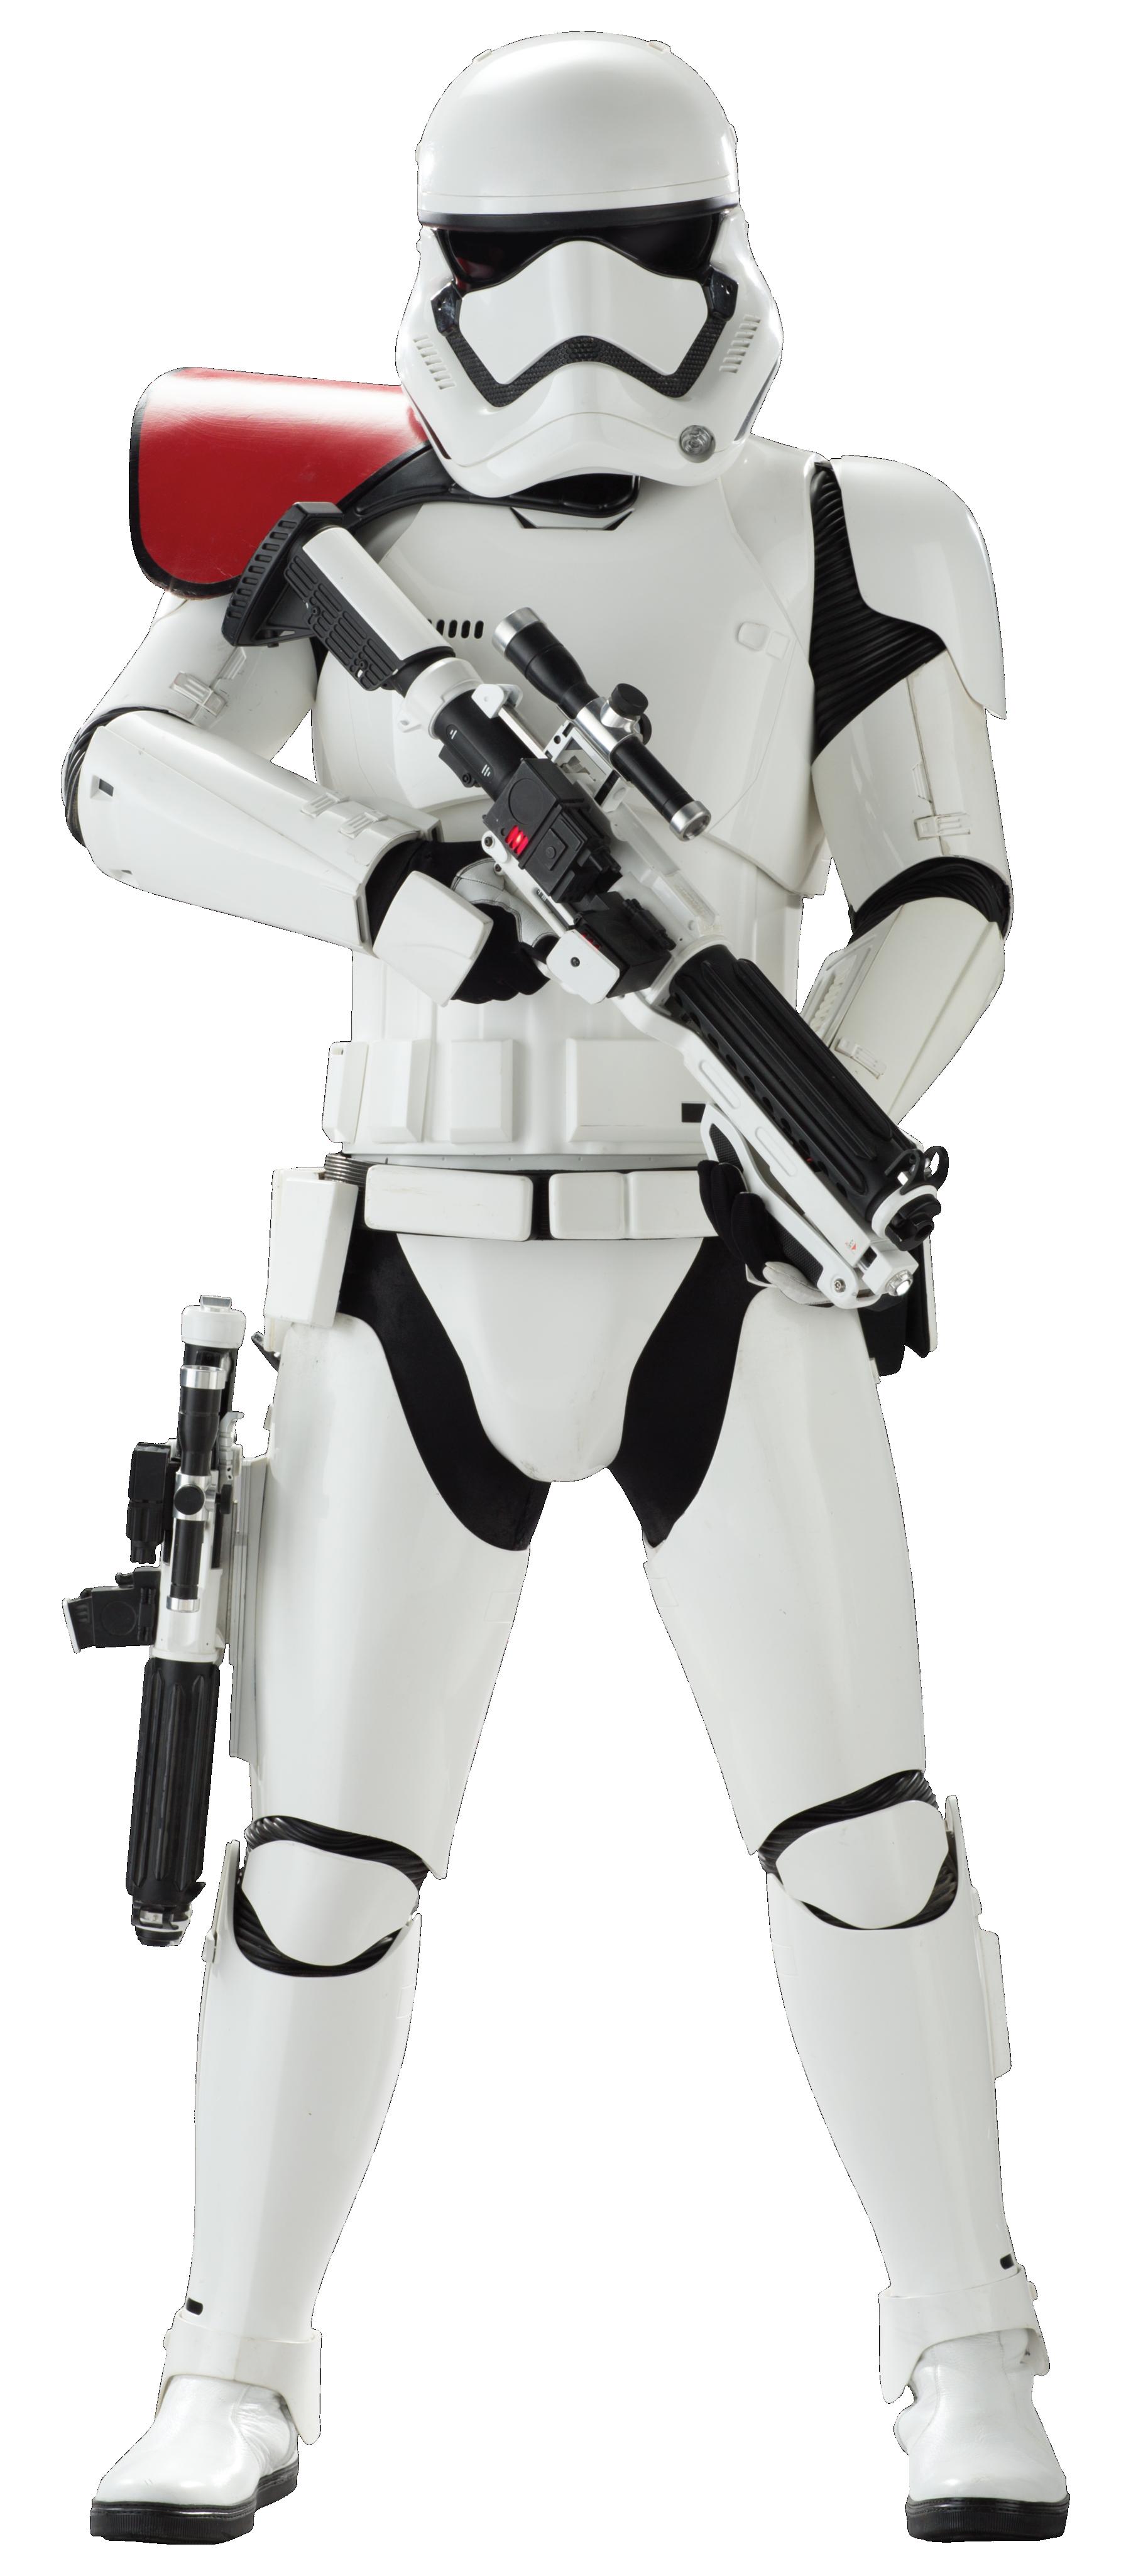 Stormtrooper First Order Wookieepedia Fandom Powered